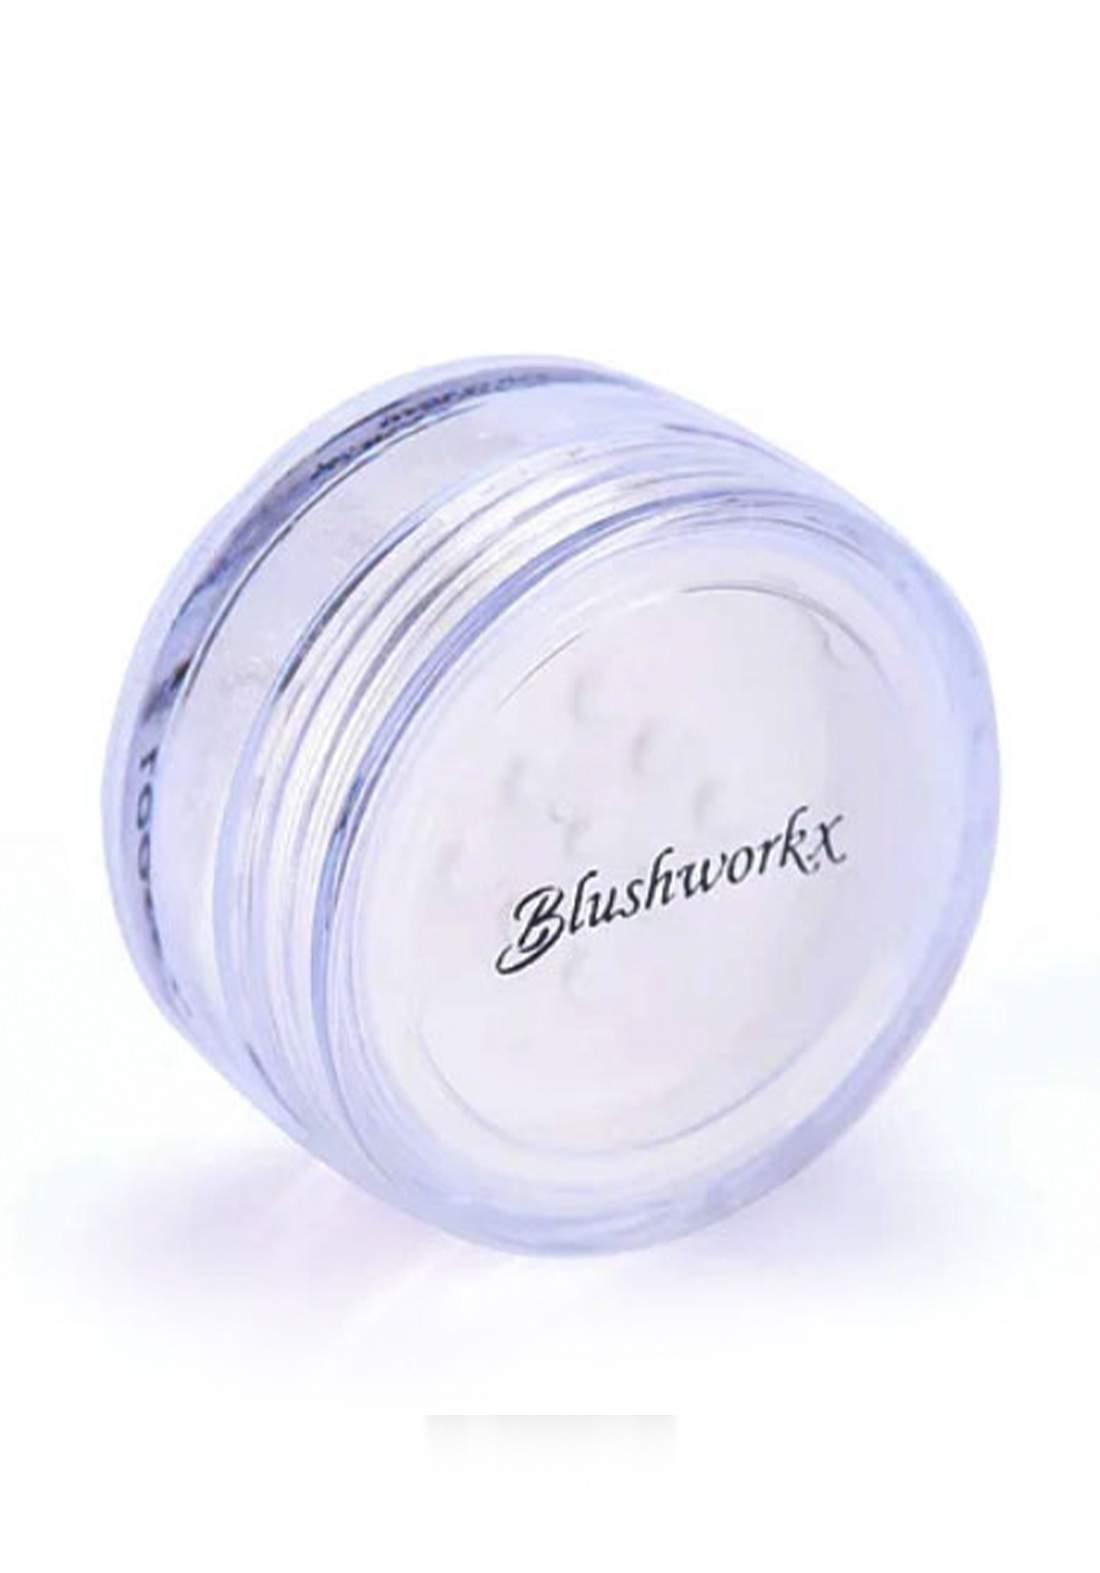 Blushworkx Hollywood Mineral Eye Dust No.7 White Gold  1.5g ظلال للعيون